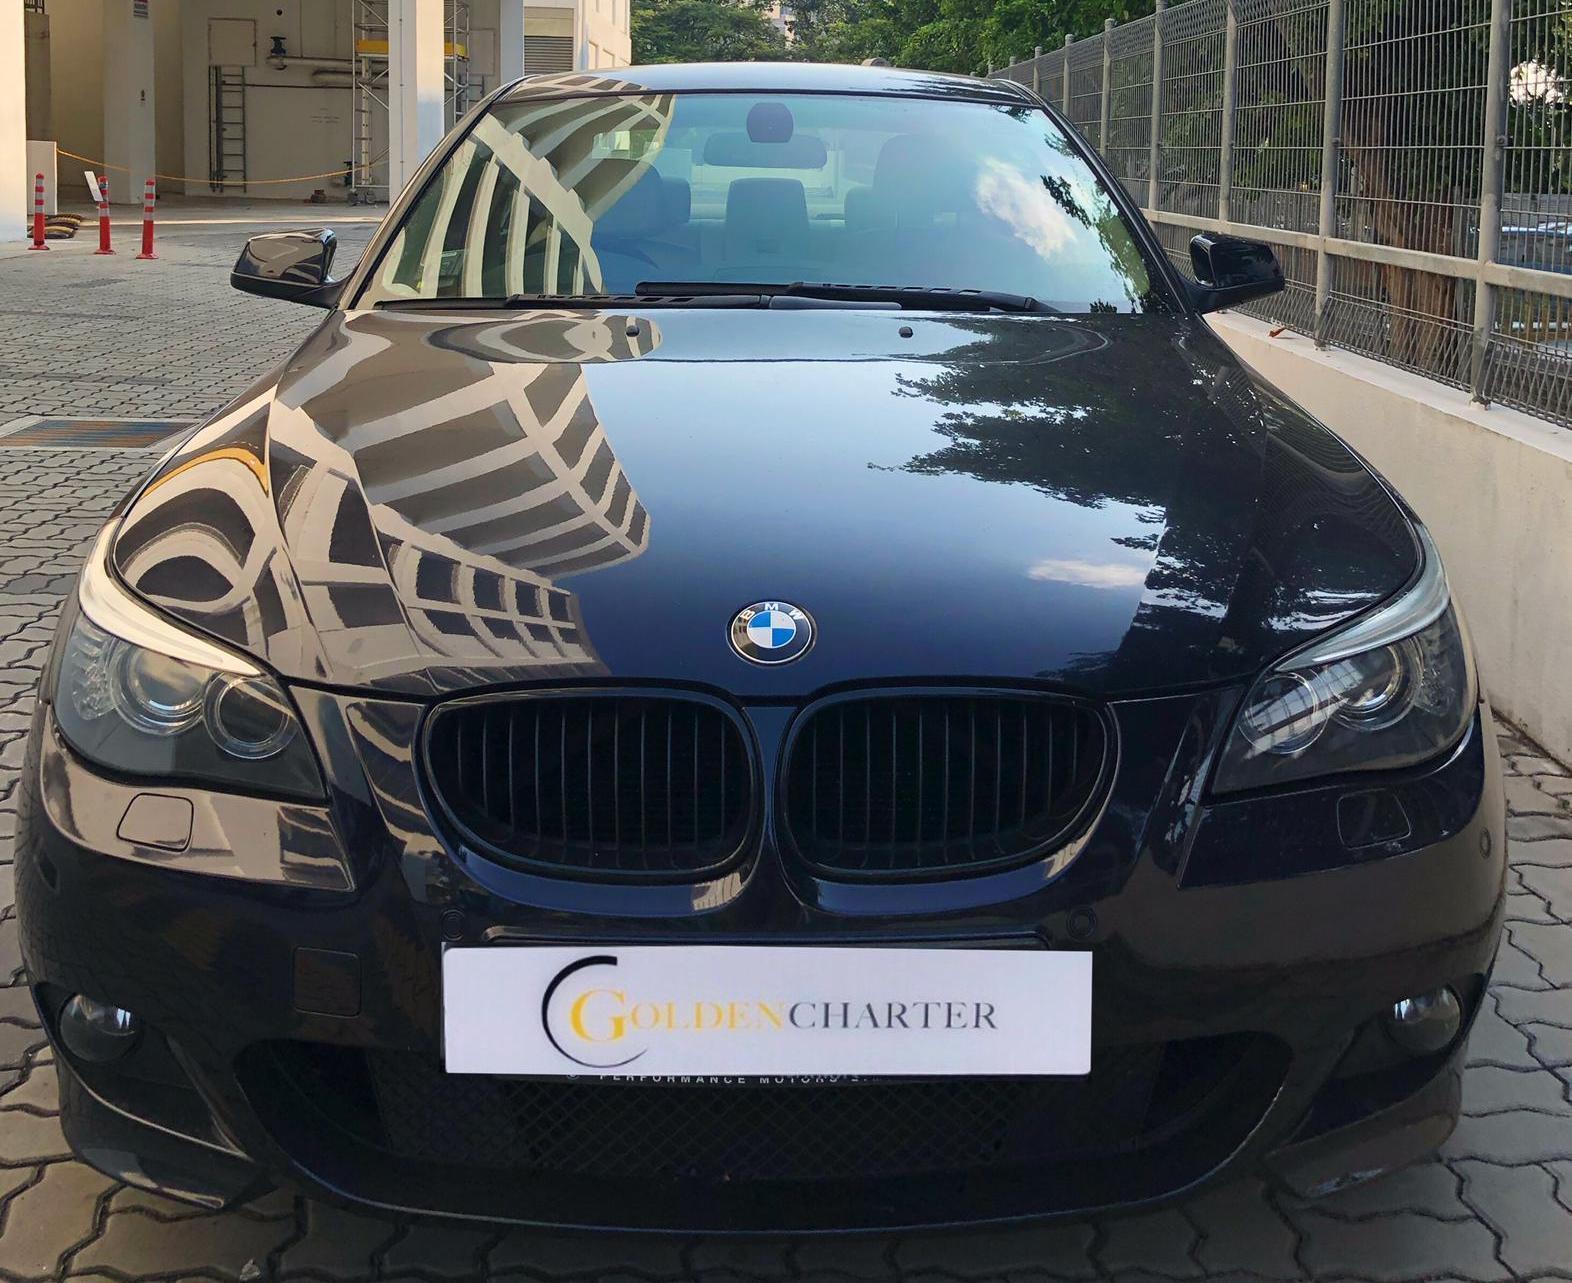 BMW 525I $67 Toyota Vios Wish Altis Car Axio Premio Allion Camry Estima Honda Jazz Fit Stream Civic Cars Hyundai Avante Mazda 3 2 For Rent Lease To Own Grab Rental Gojek Or Personal Use Low price and Cheap Cars